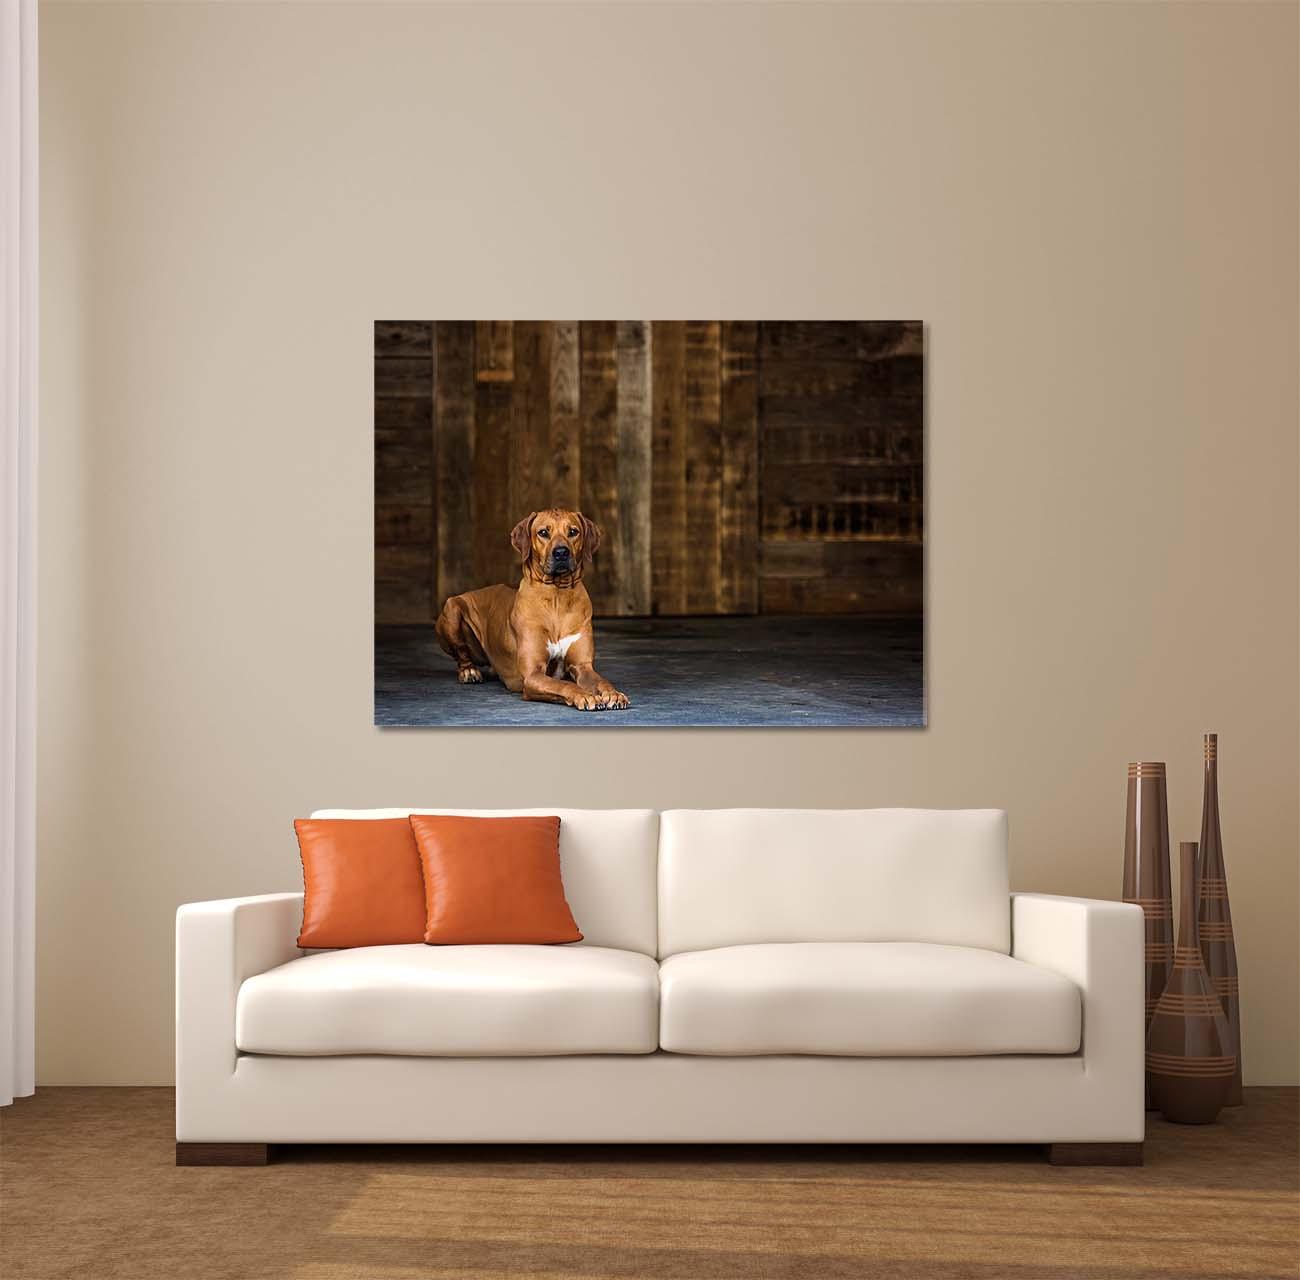 Framed Print of Rhodesian Ridgeback Dog over Couch